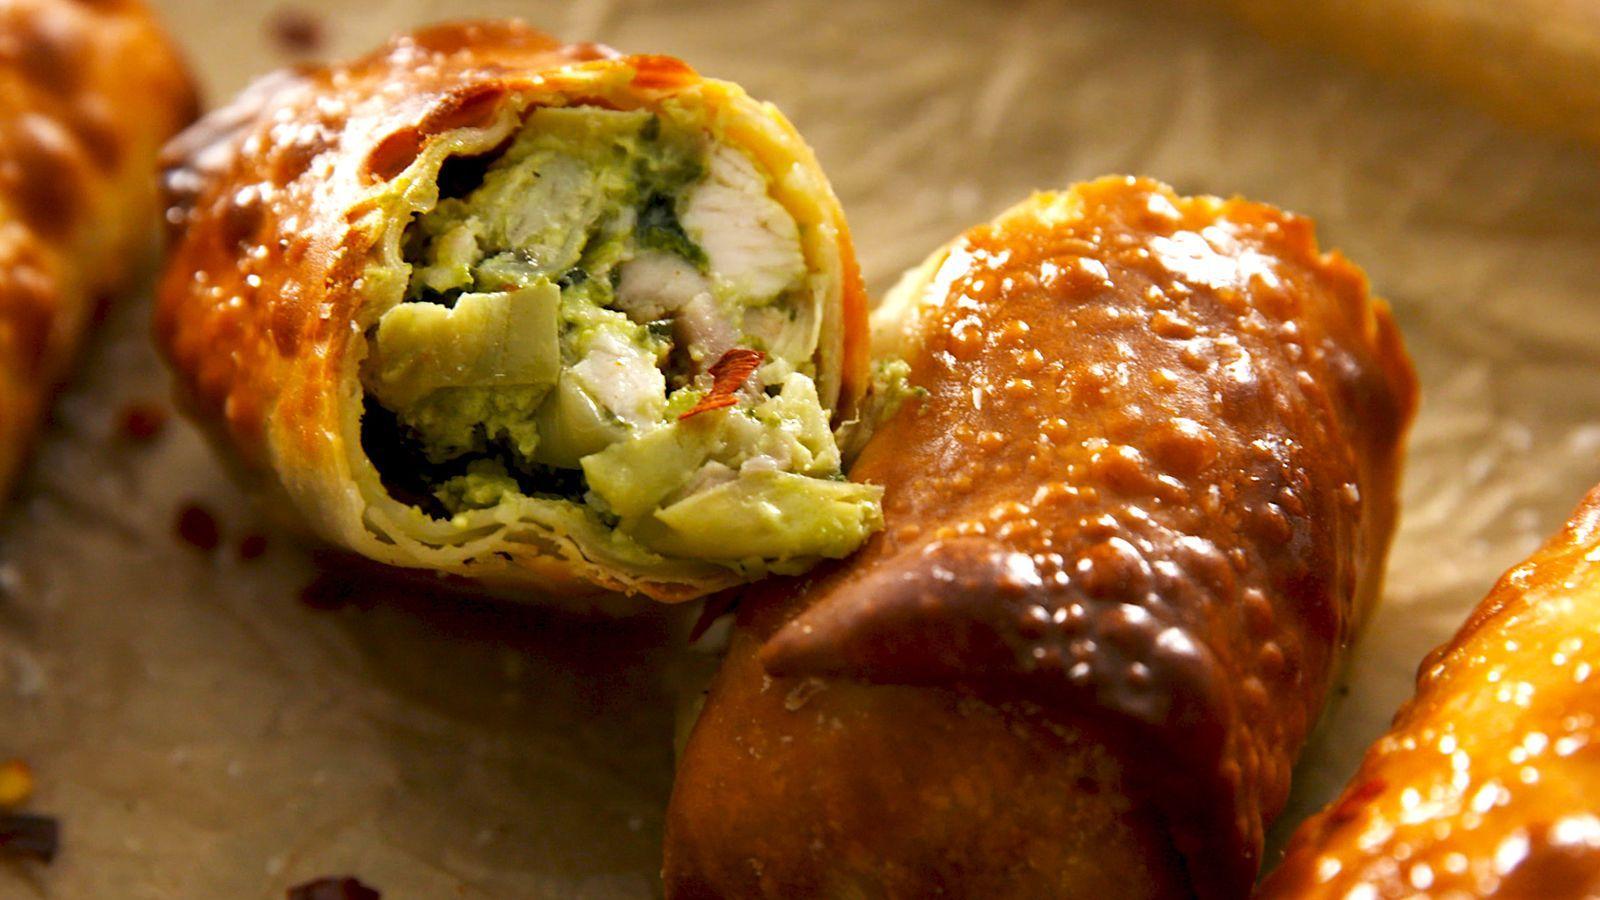 Air Fryer Avocado Spinach Artichoke Egg Rolls Recipe